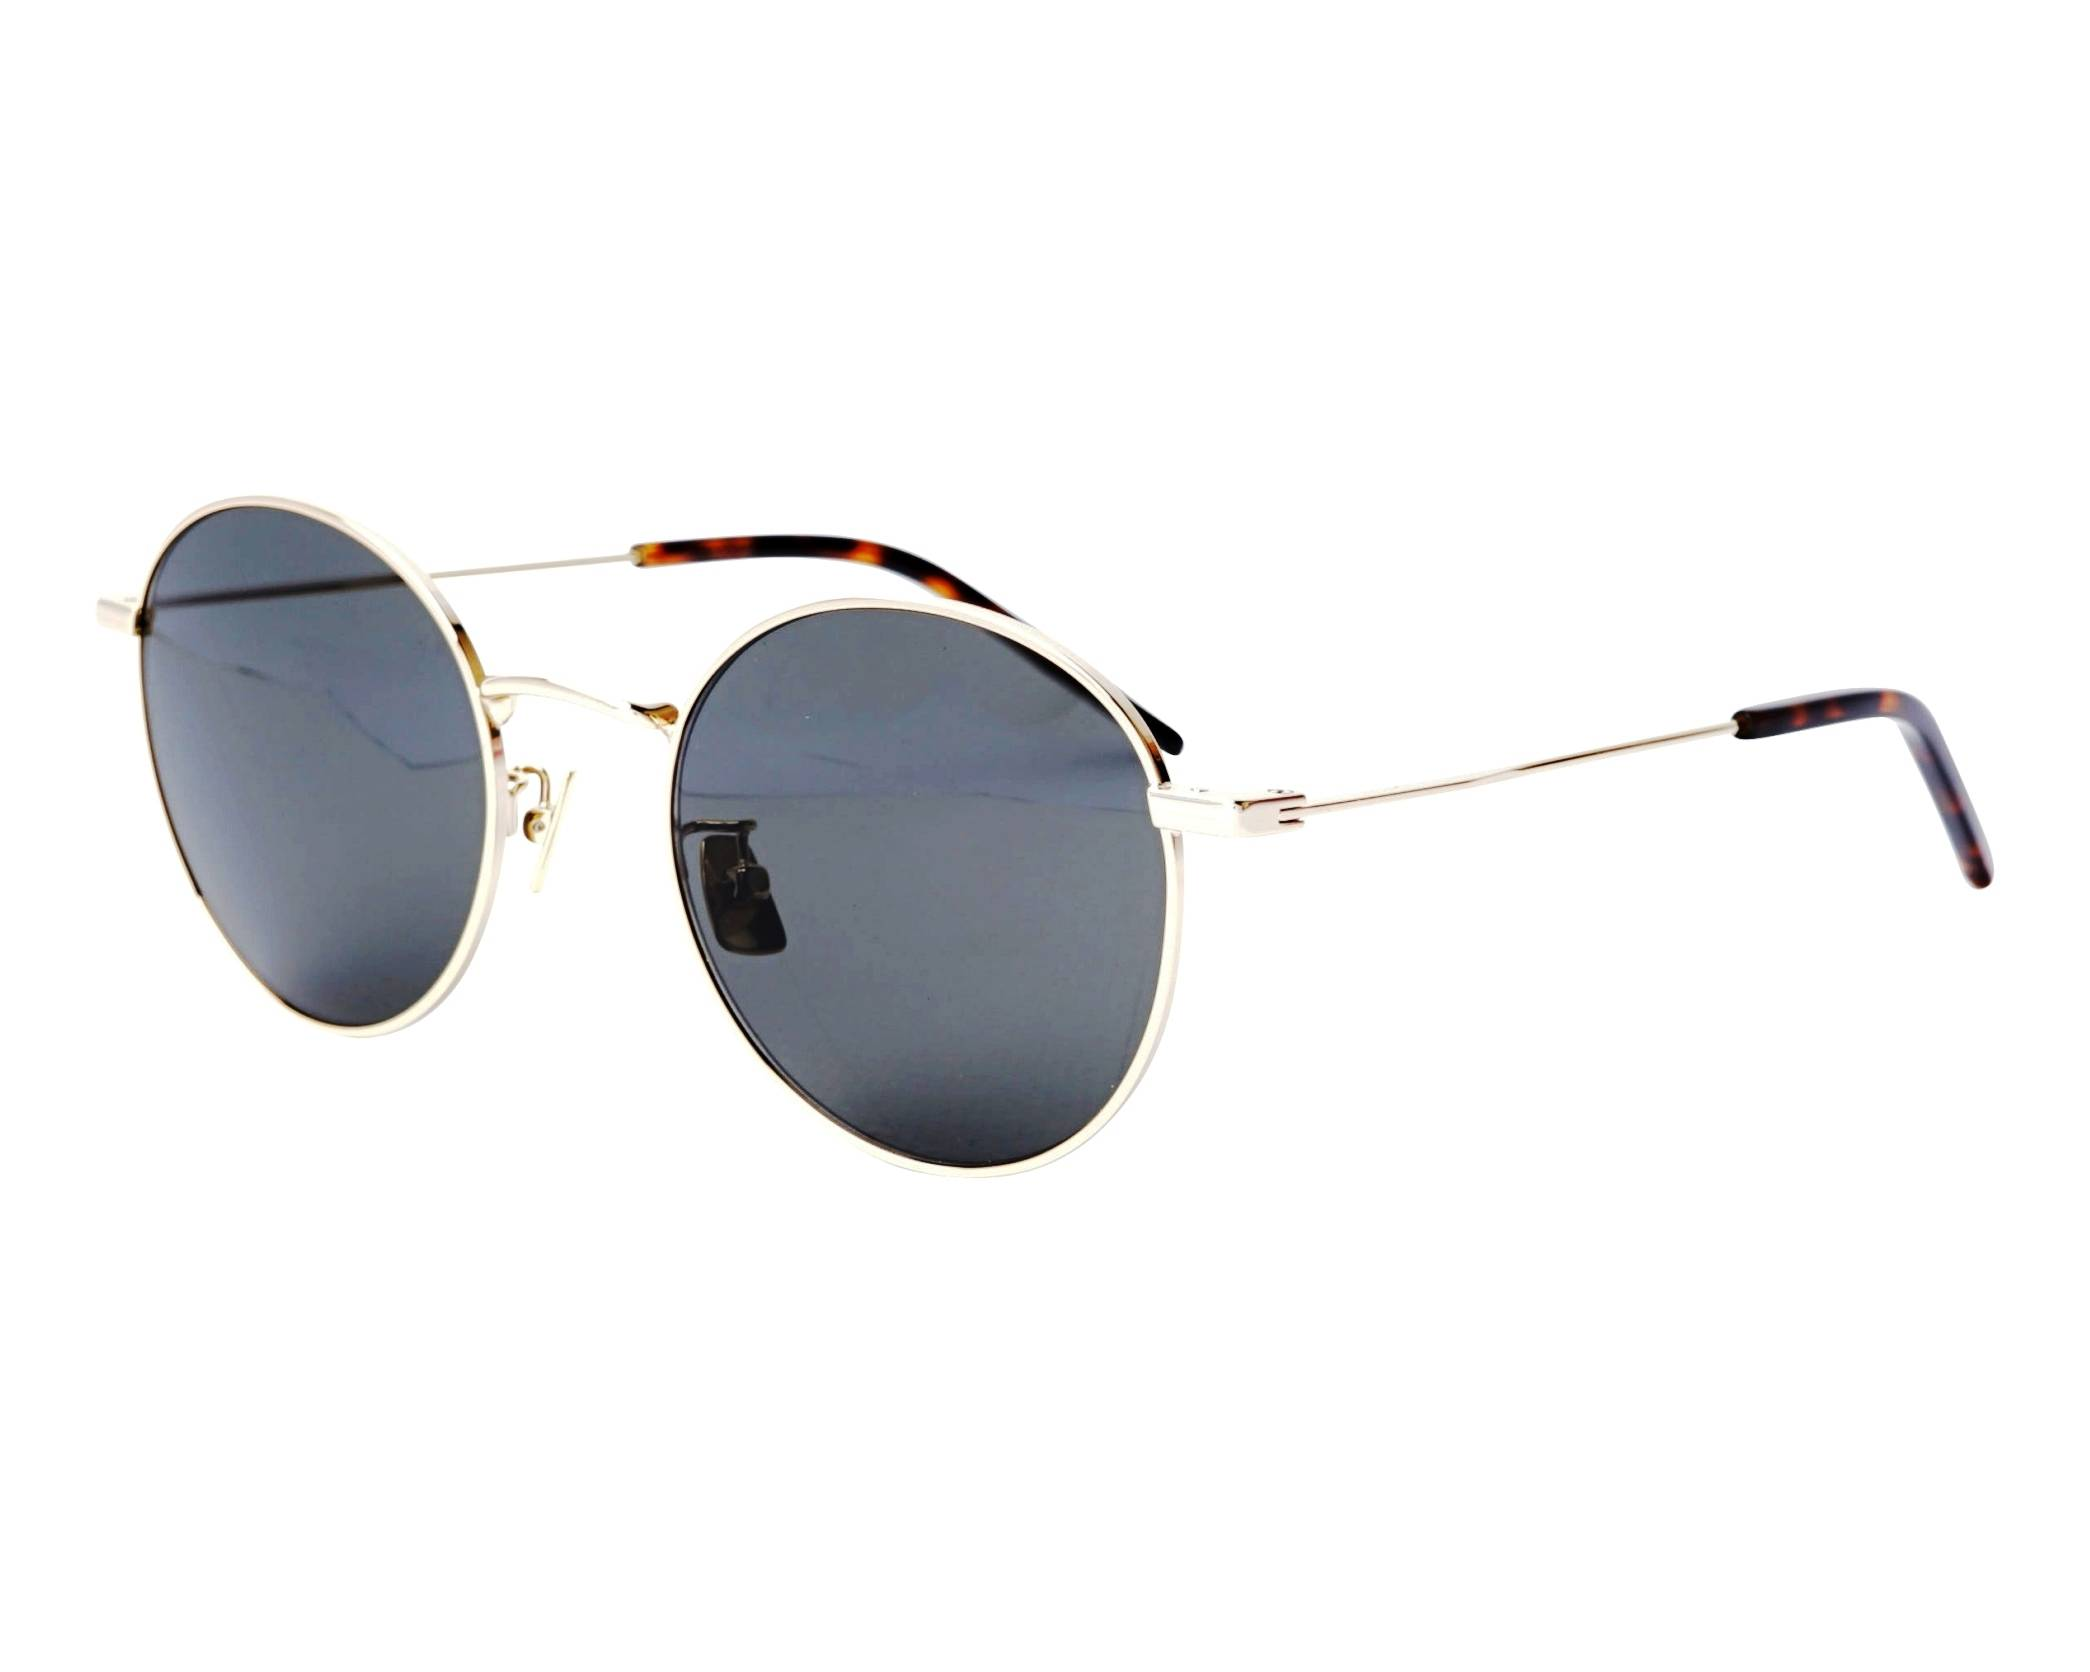 0ada7c08f74 Sunglasses Yves Saint Laurent SL-250 004 52-21 Gold profile view